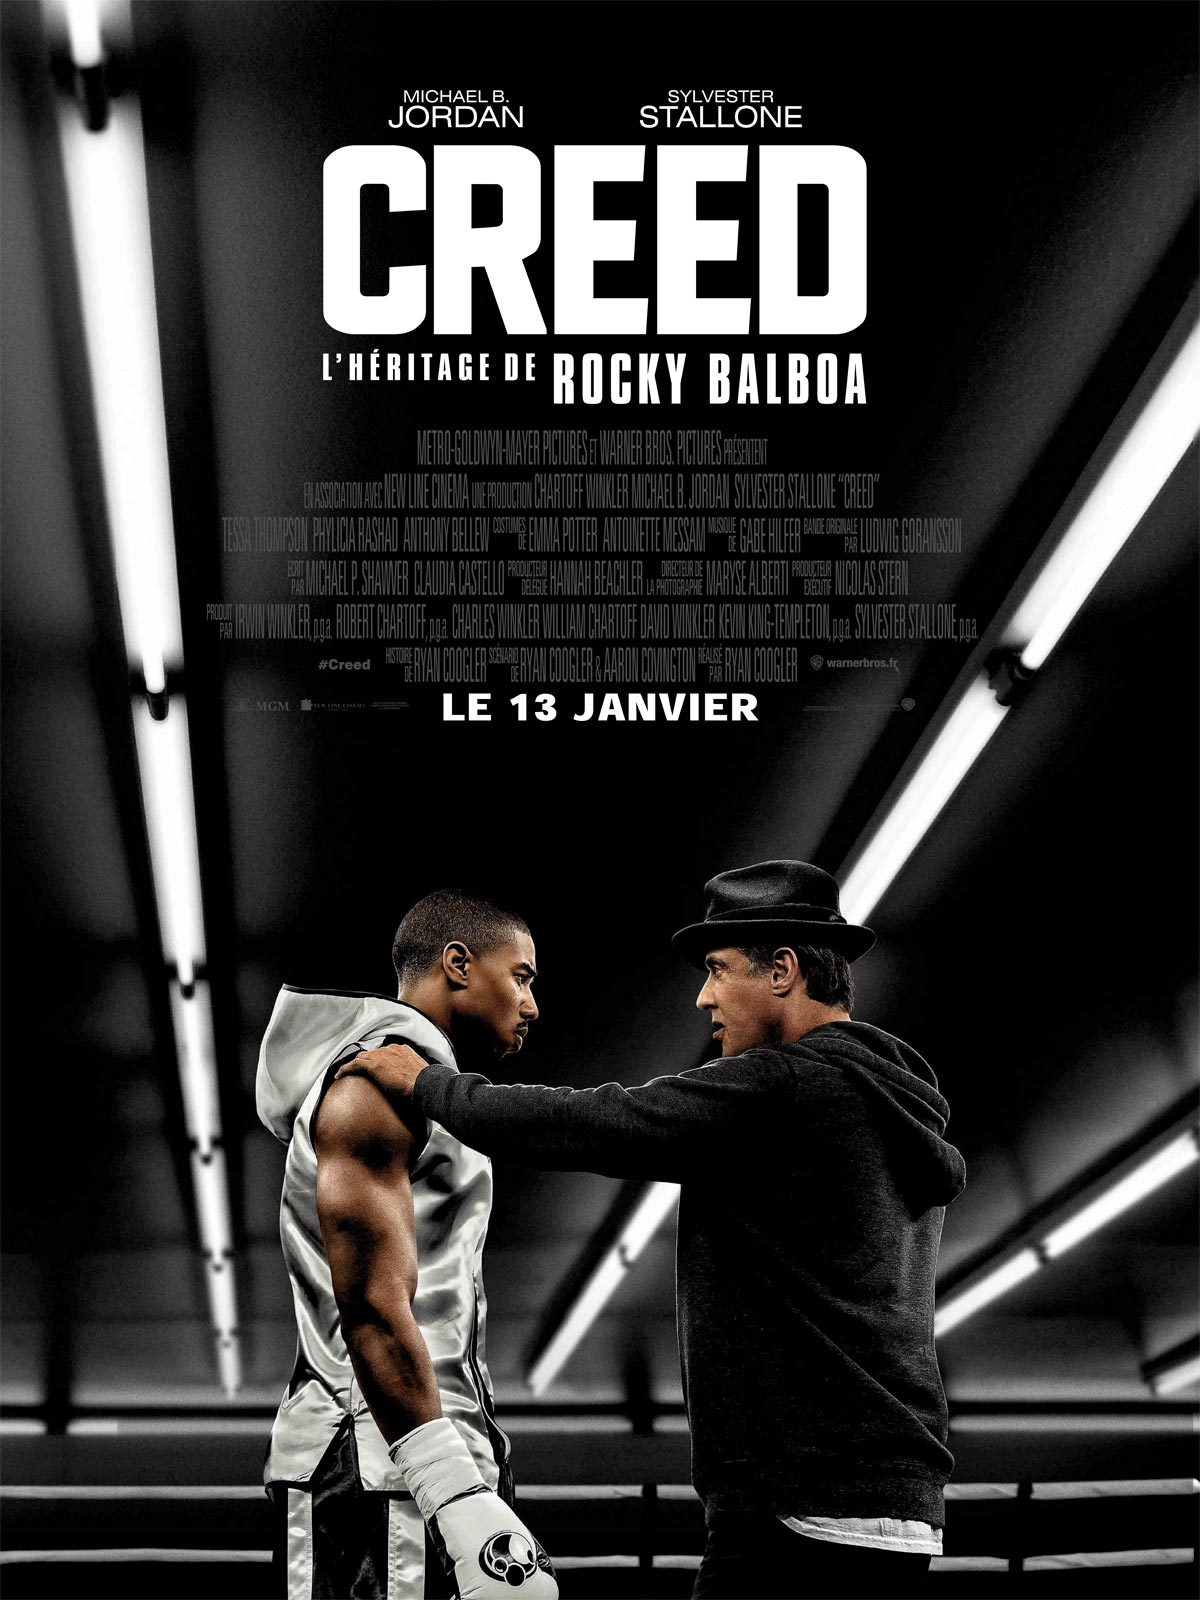 Creed L'Héritage de Rocky Balboa